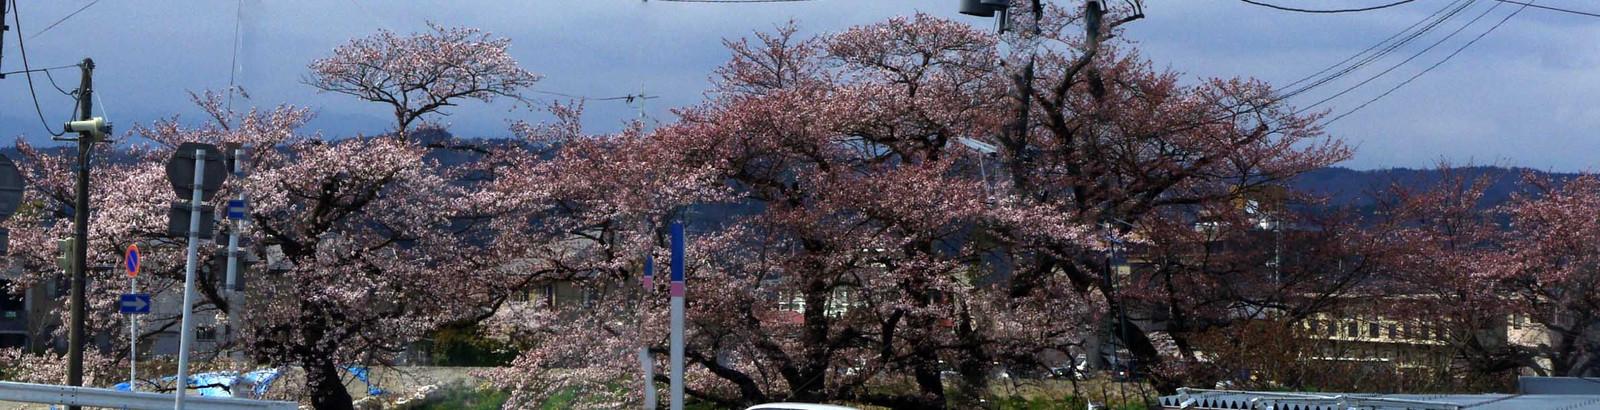 2012_04_21_3949_edited1